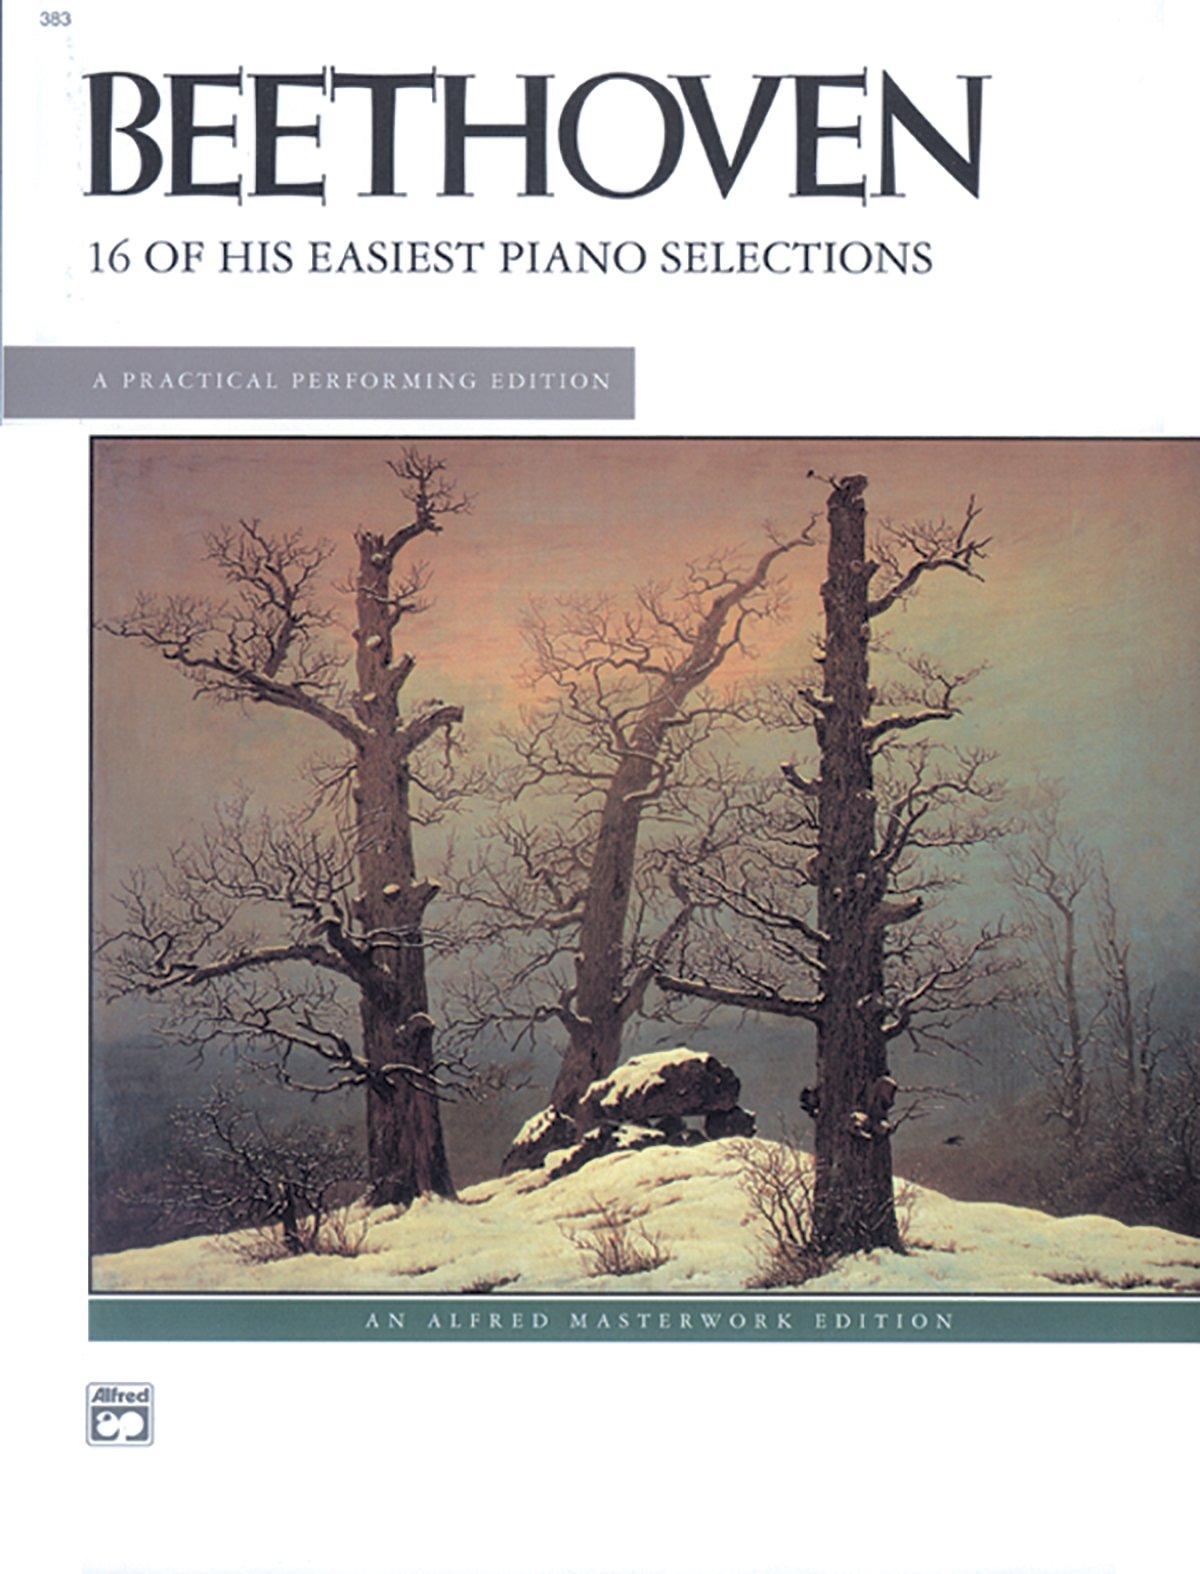 Beethoven -- 16 Easiest Selections (Alfred Masterwork Edition): Ludwig van  Beethoven, Willard A. Palmer: 9780739020227: Amazon.com: Books